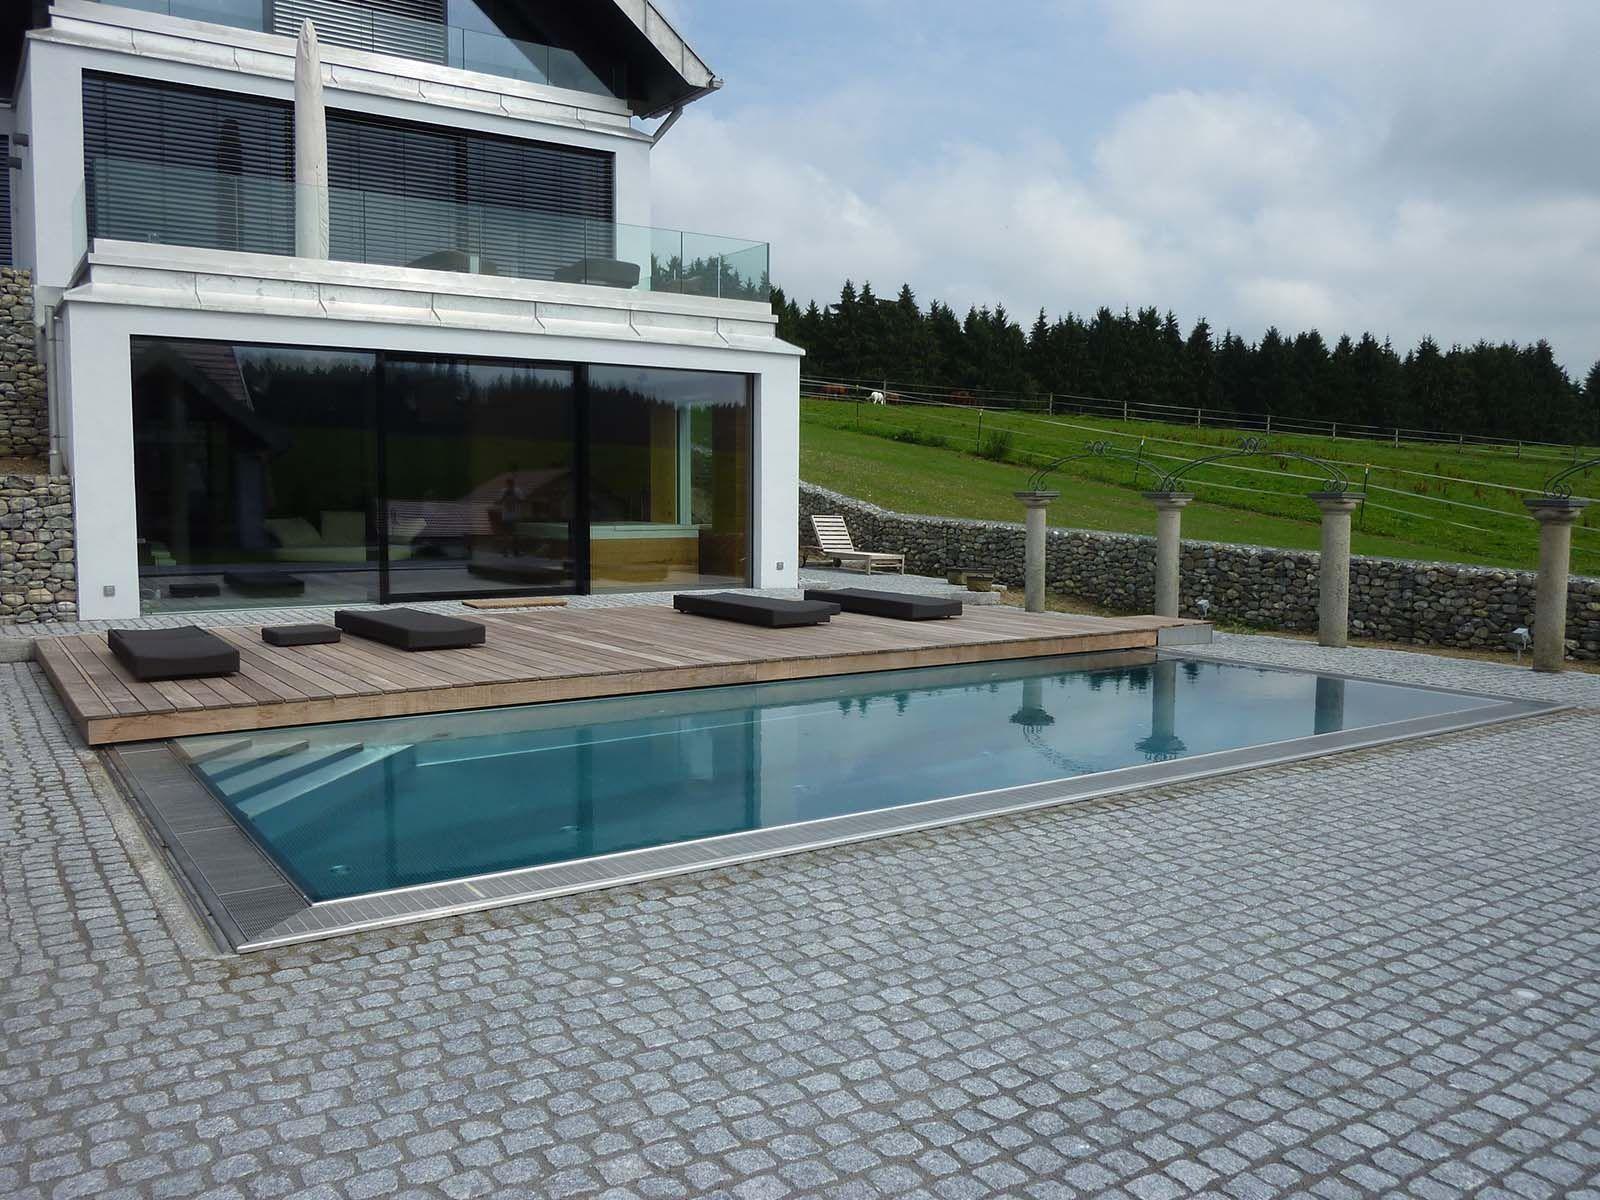 begehbare schwimmbadabdeckung pool pinterest. Black Bedroom Furniture Sets. Home Design Ideas